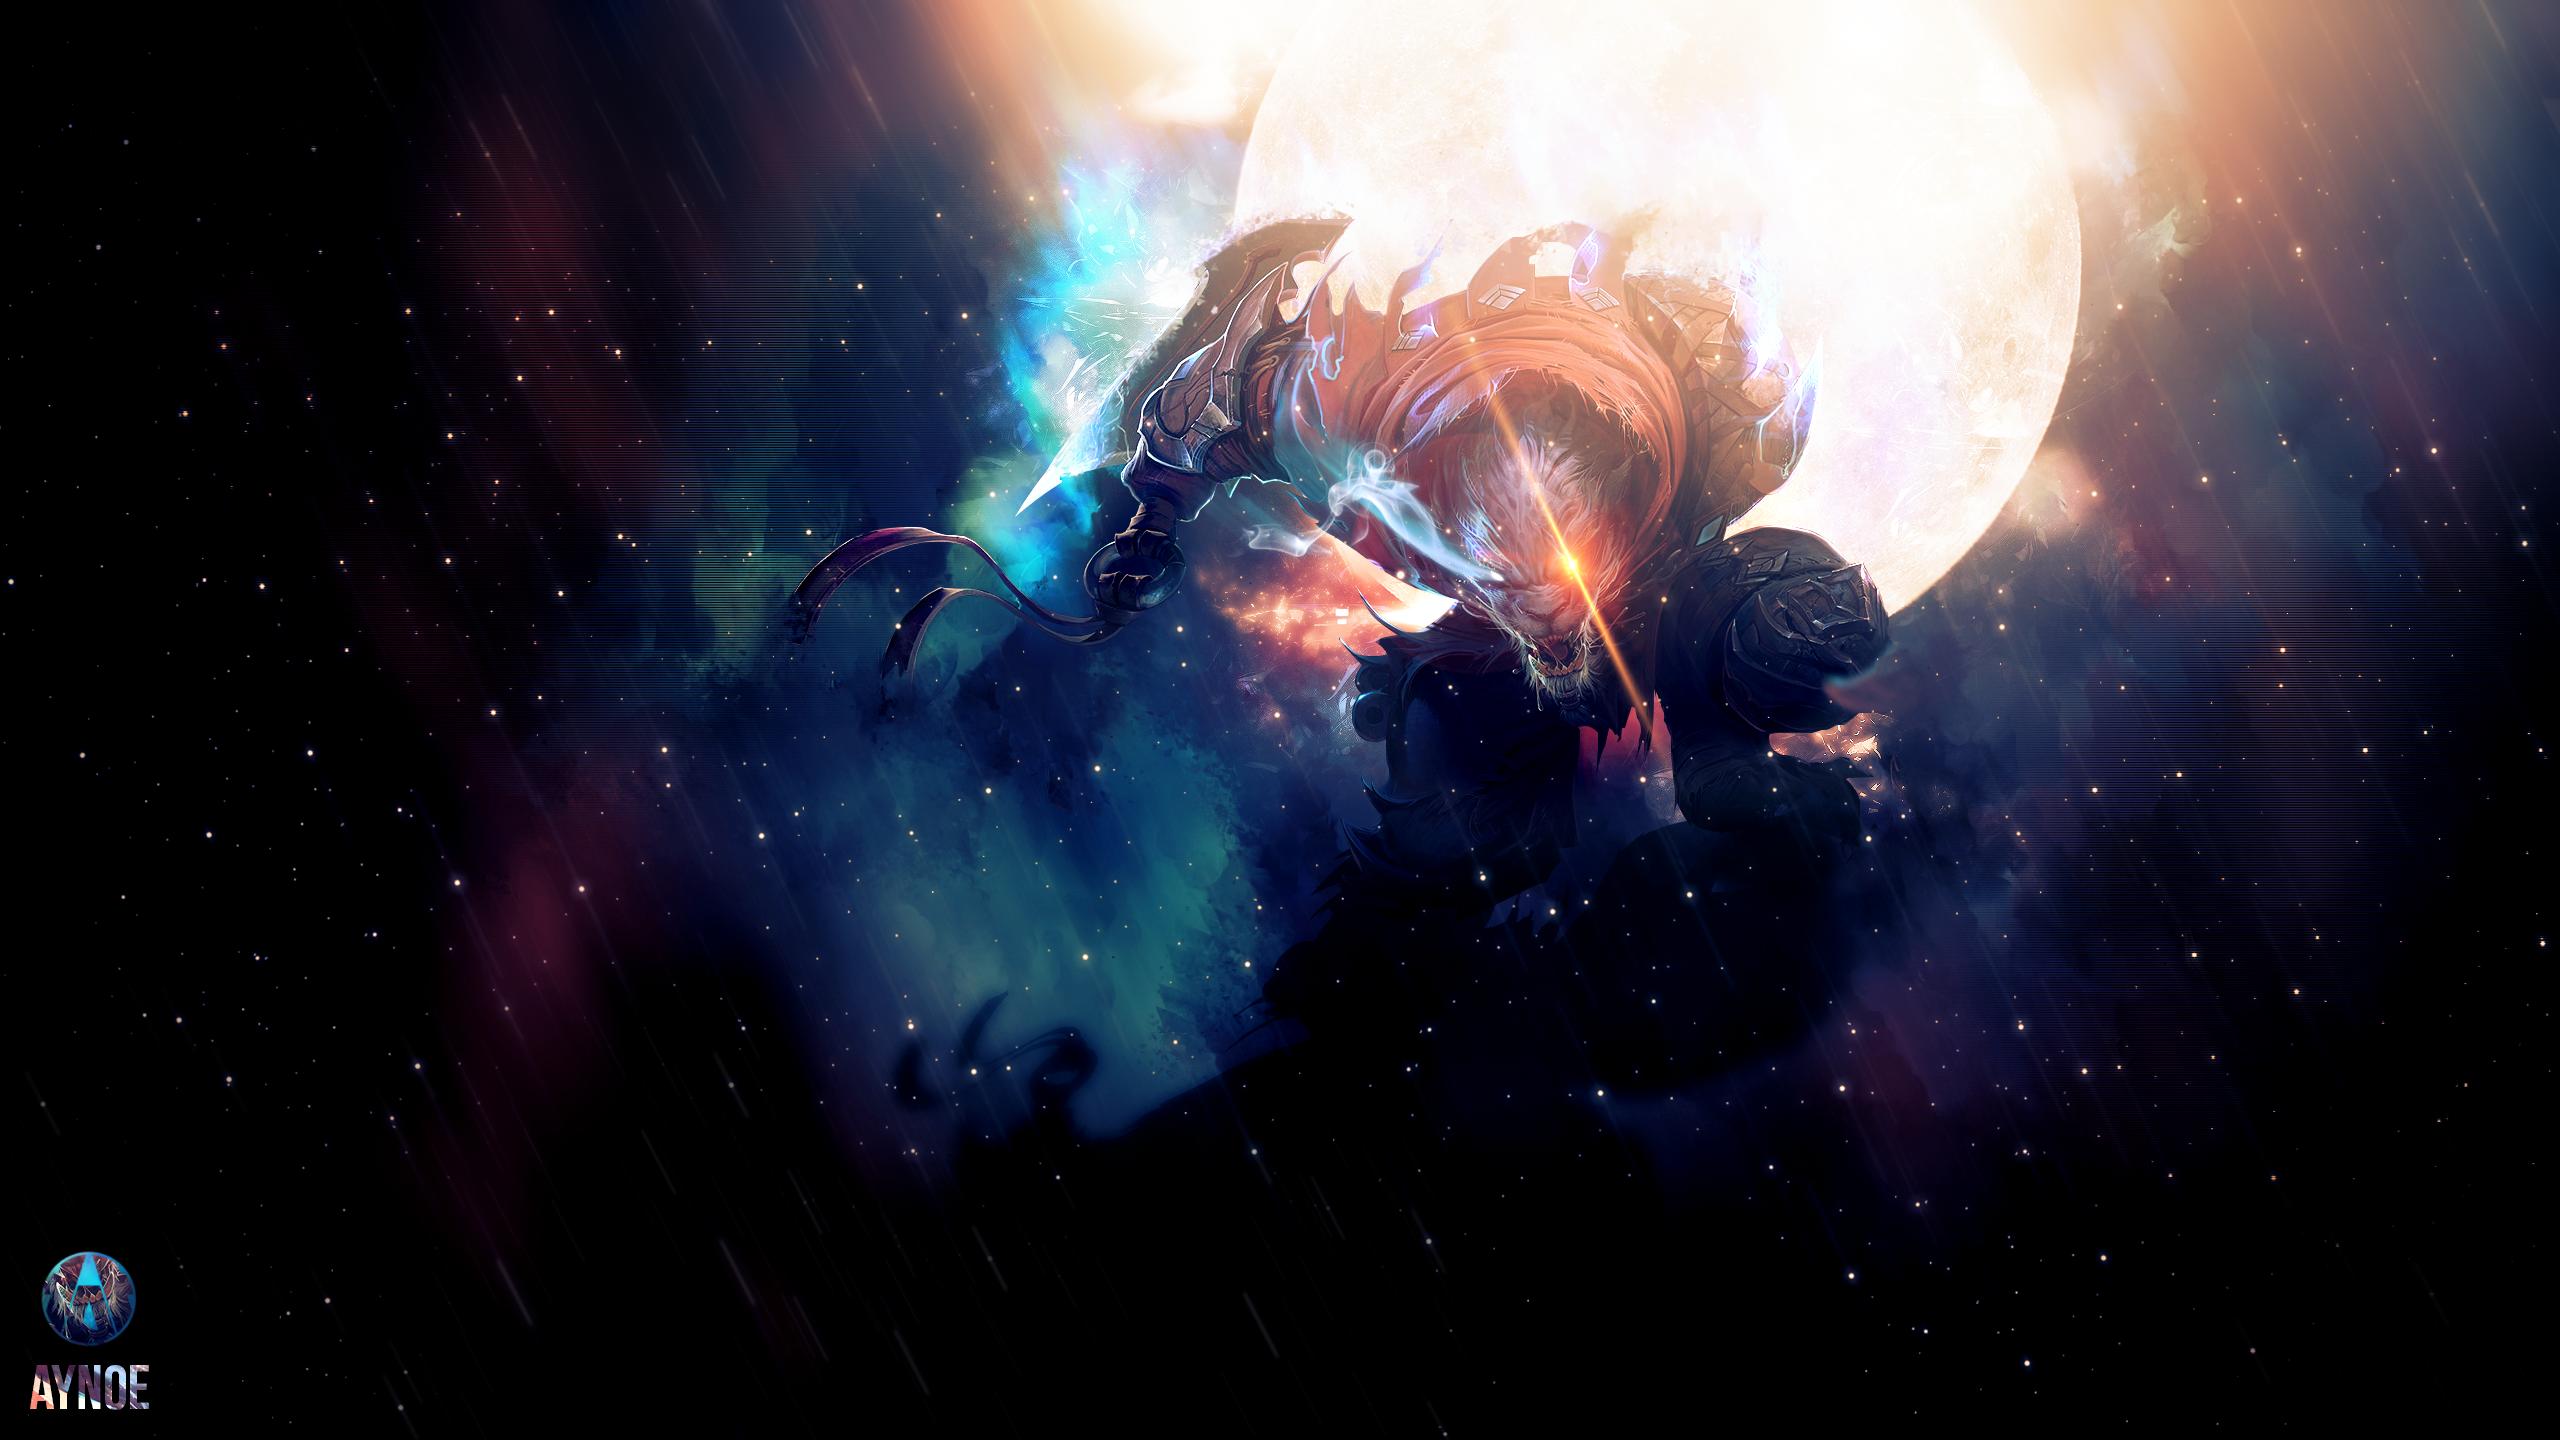 General 2560x1440 League of Legends Rengar space fantasy art video games